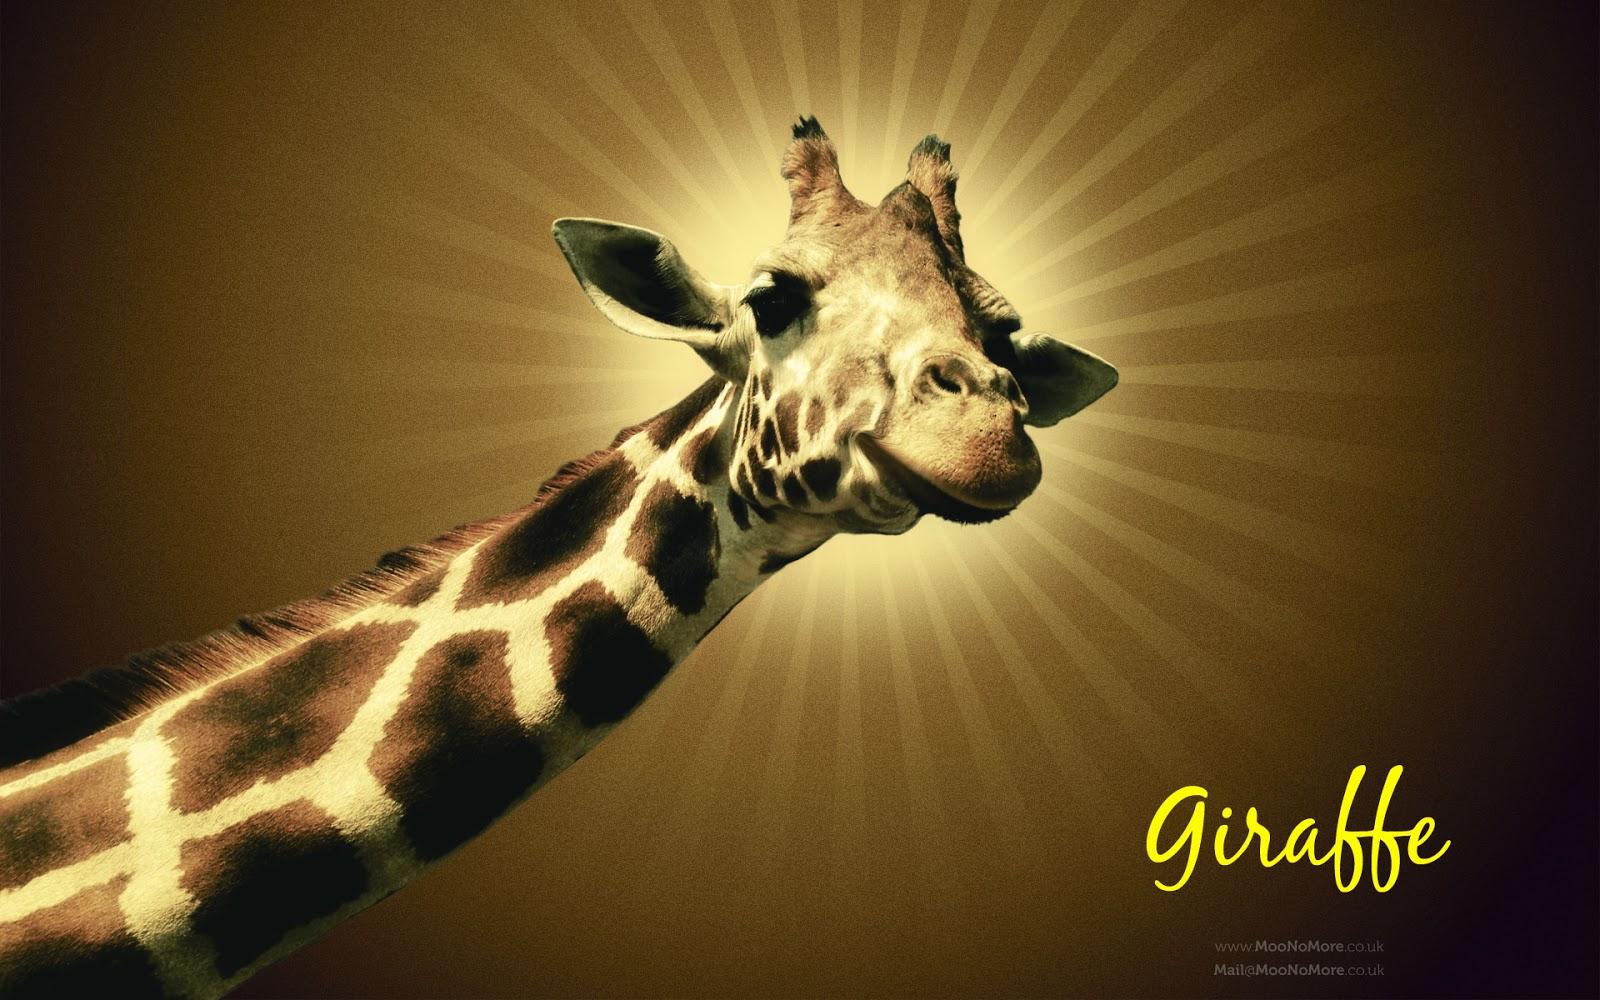 HD Wallpaper: Giraffe hd wallpapers